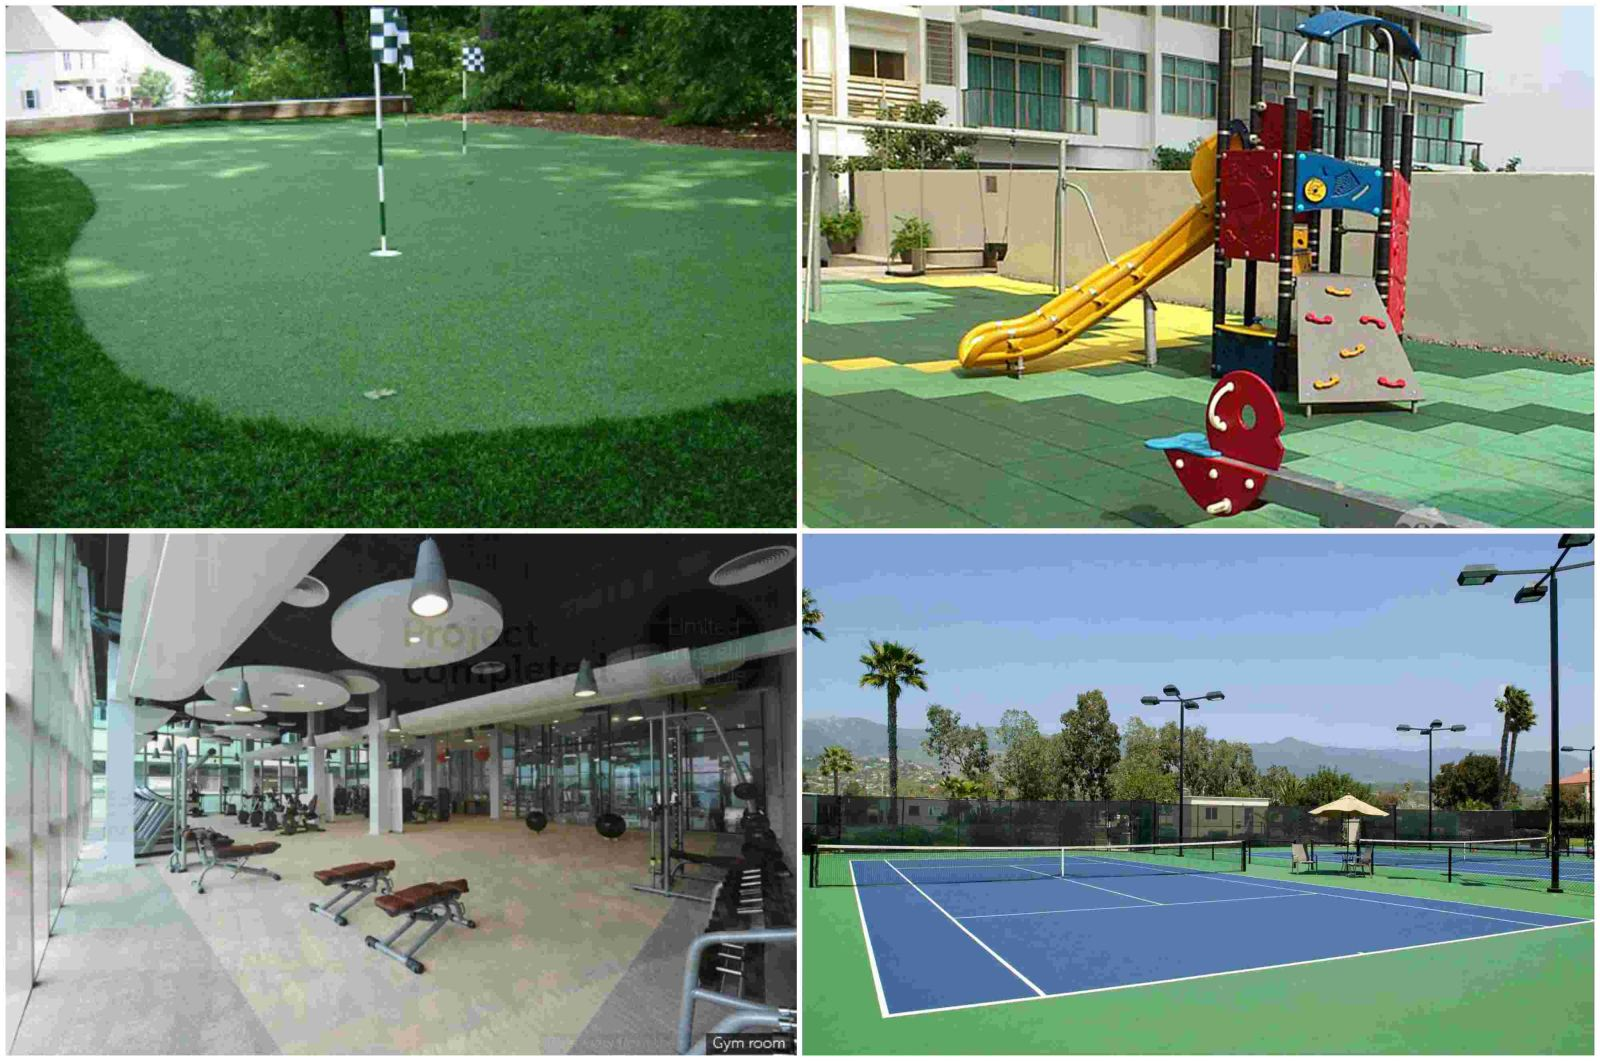 facilities-vista-an-phu-district-2-quan-apartment-for-rent-can-ho-cho-thue